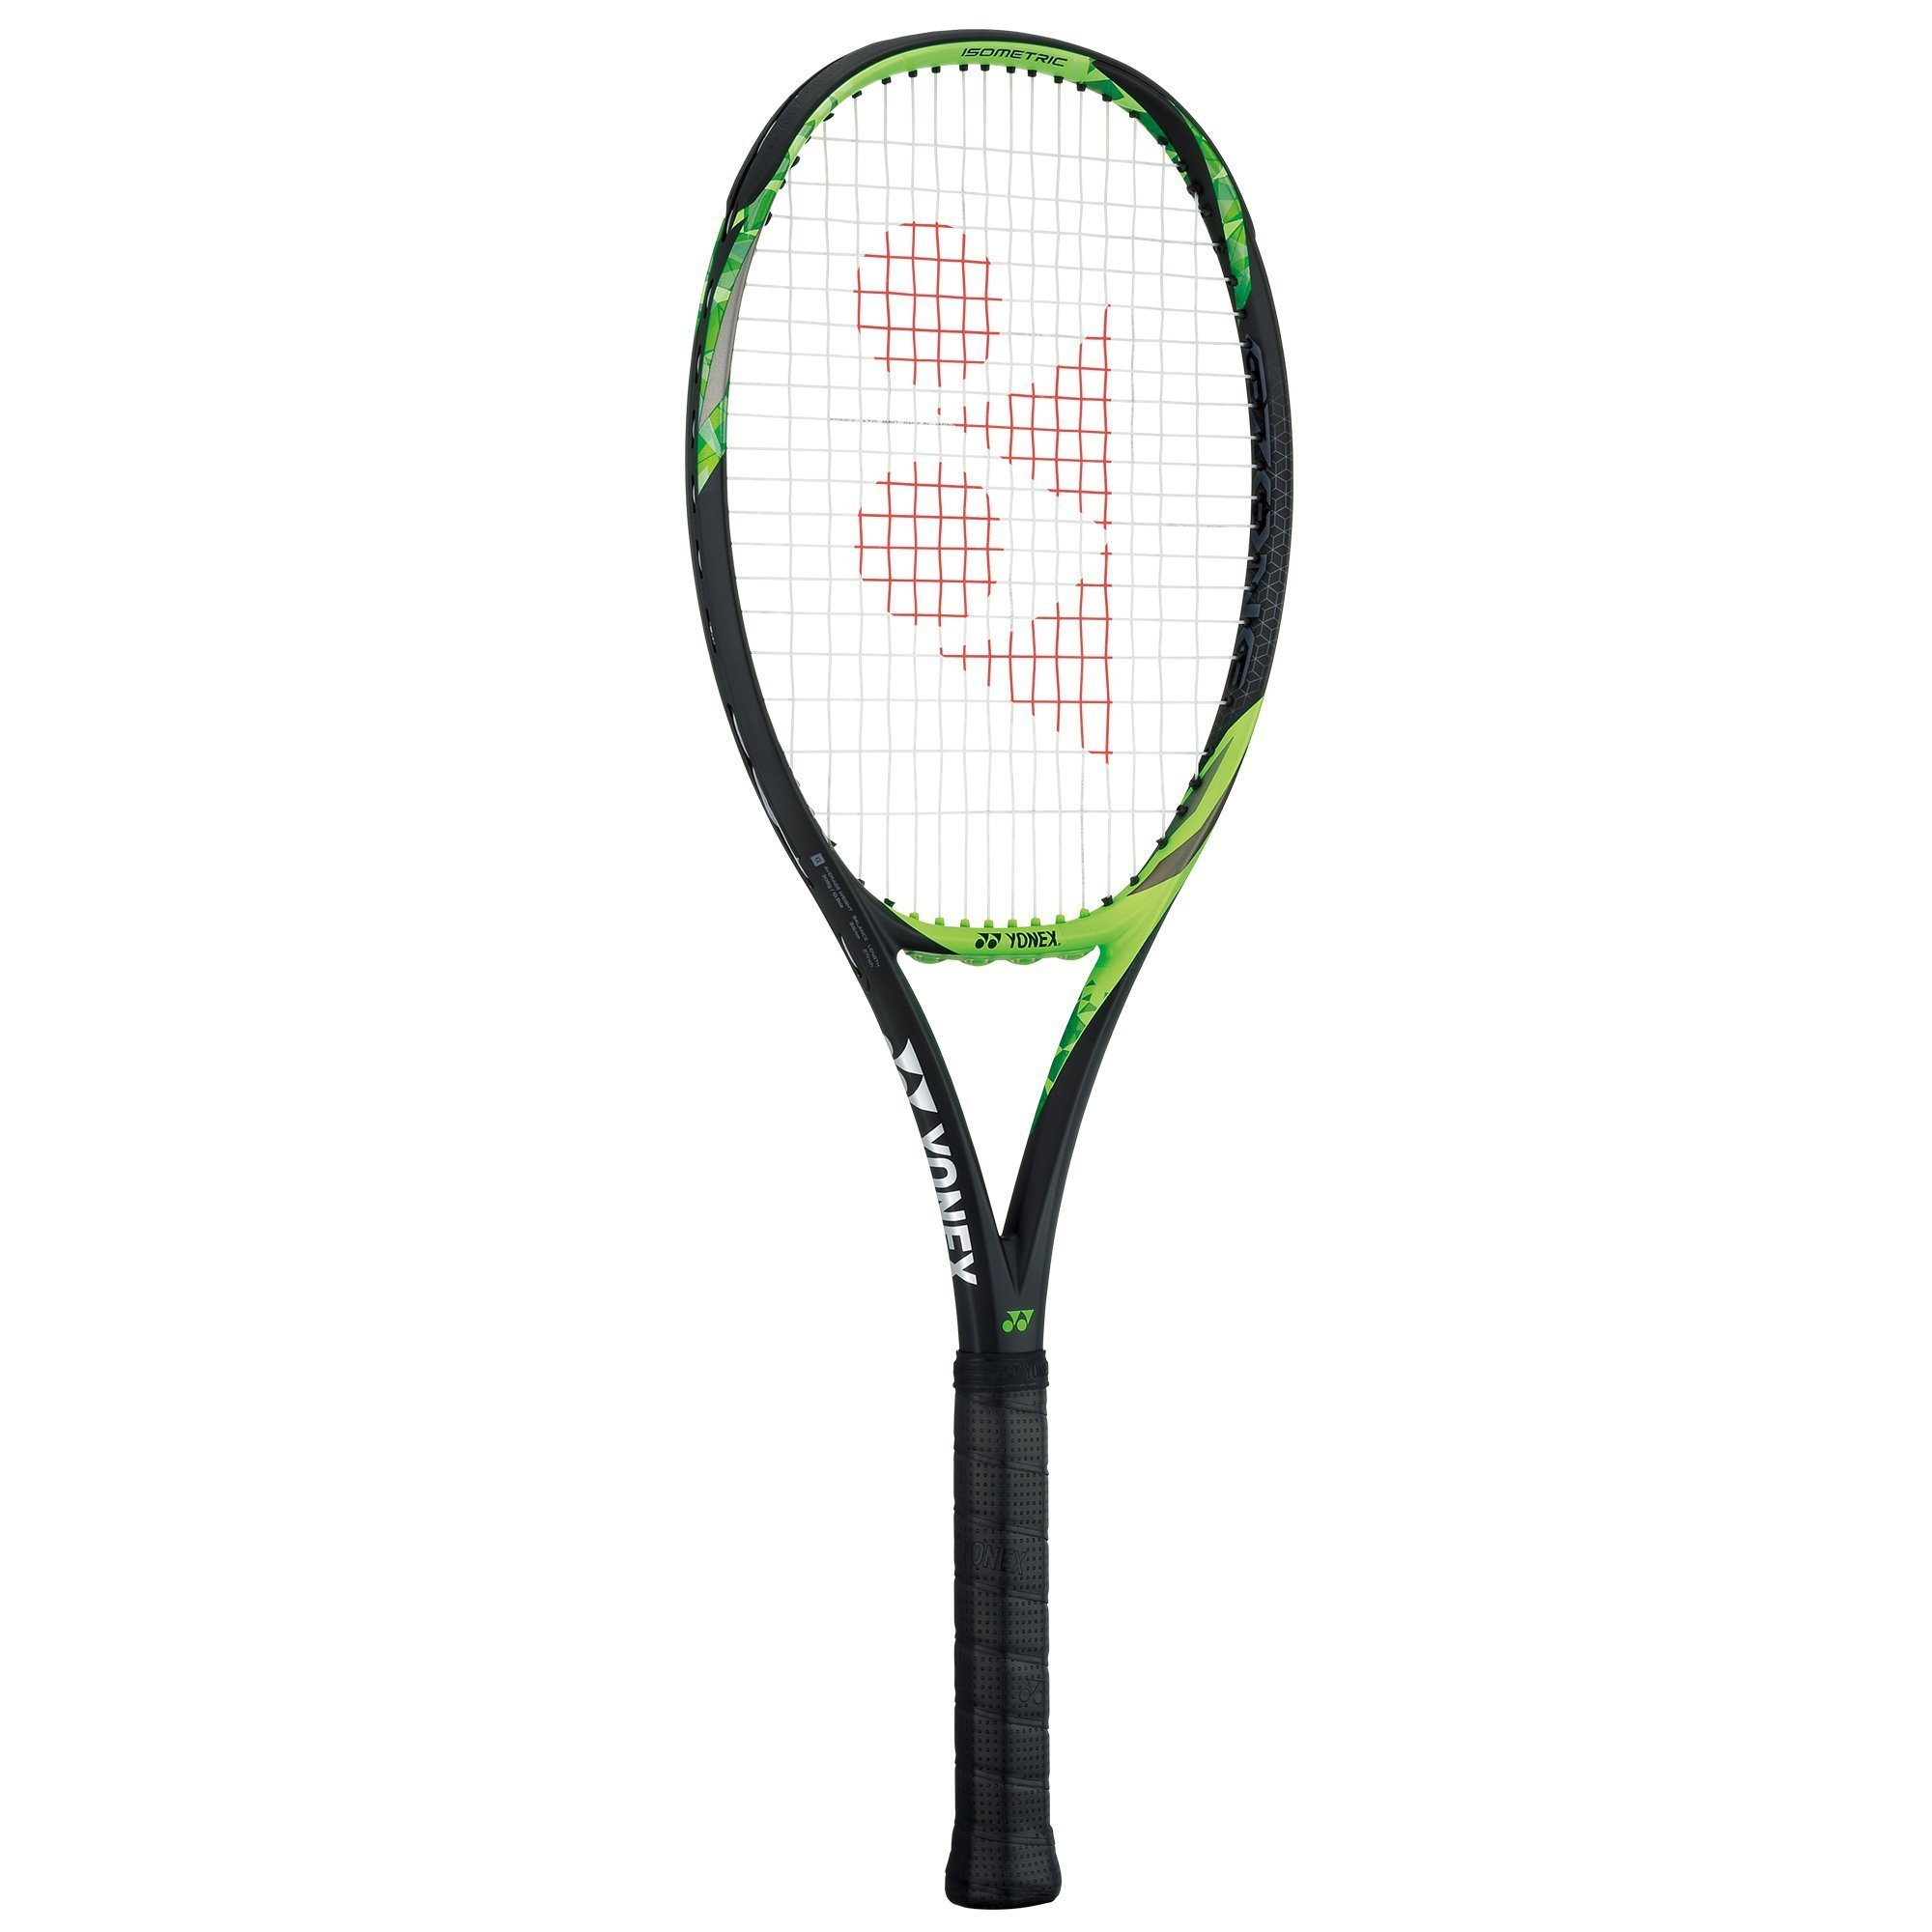 Tennis Racket – Yonex Ezone 98 (305g)